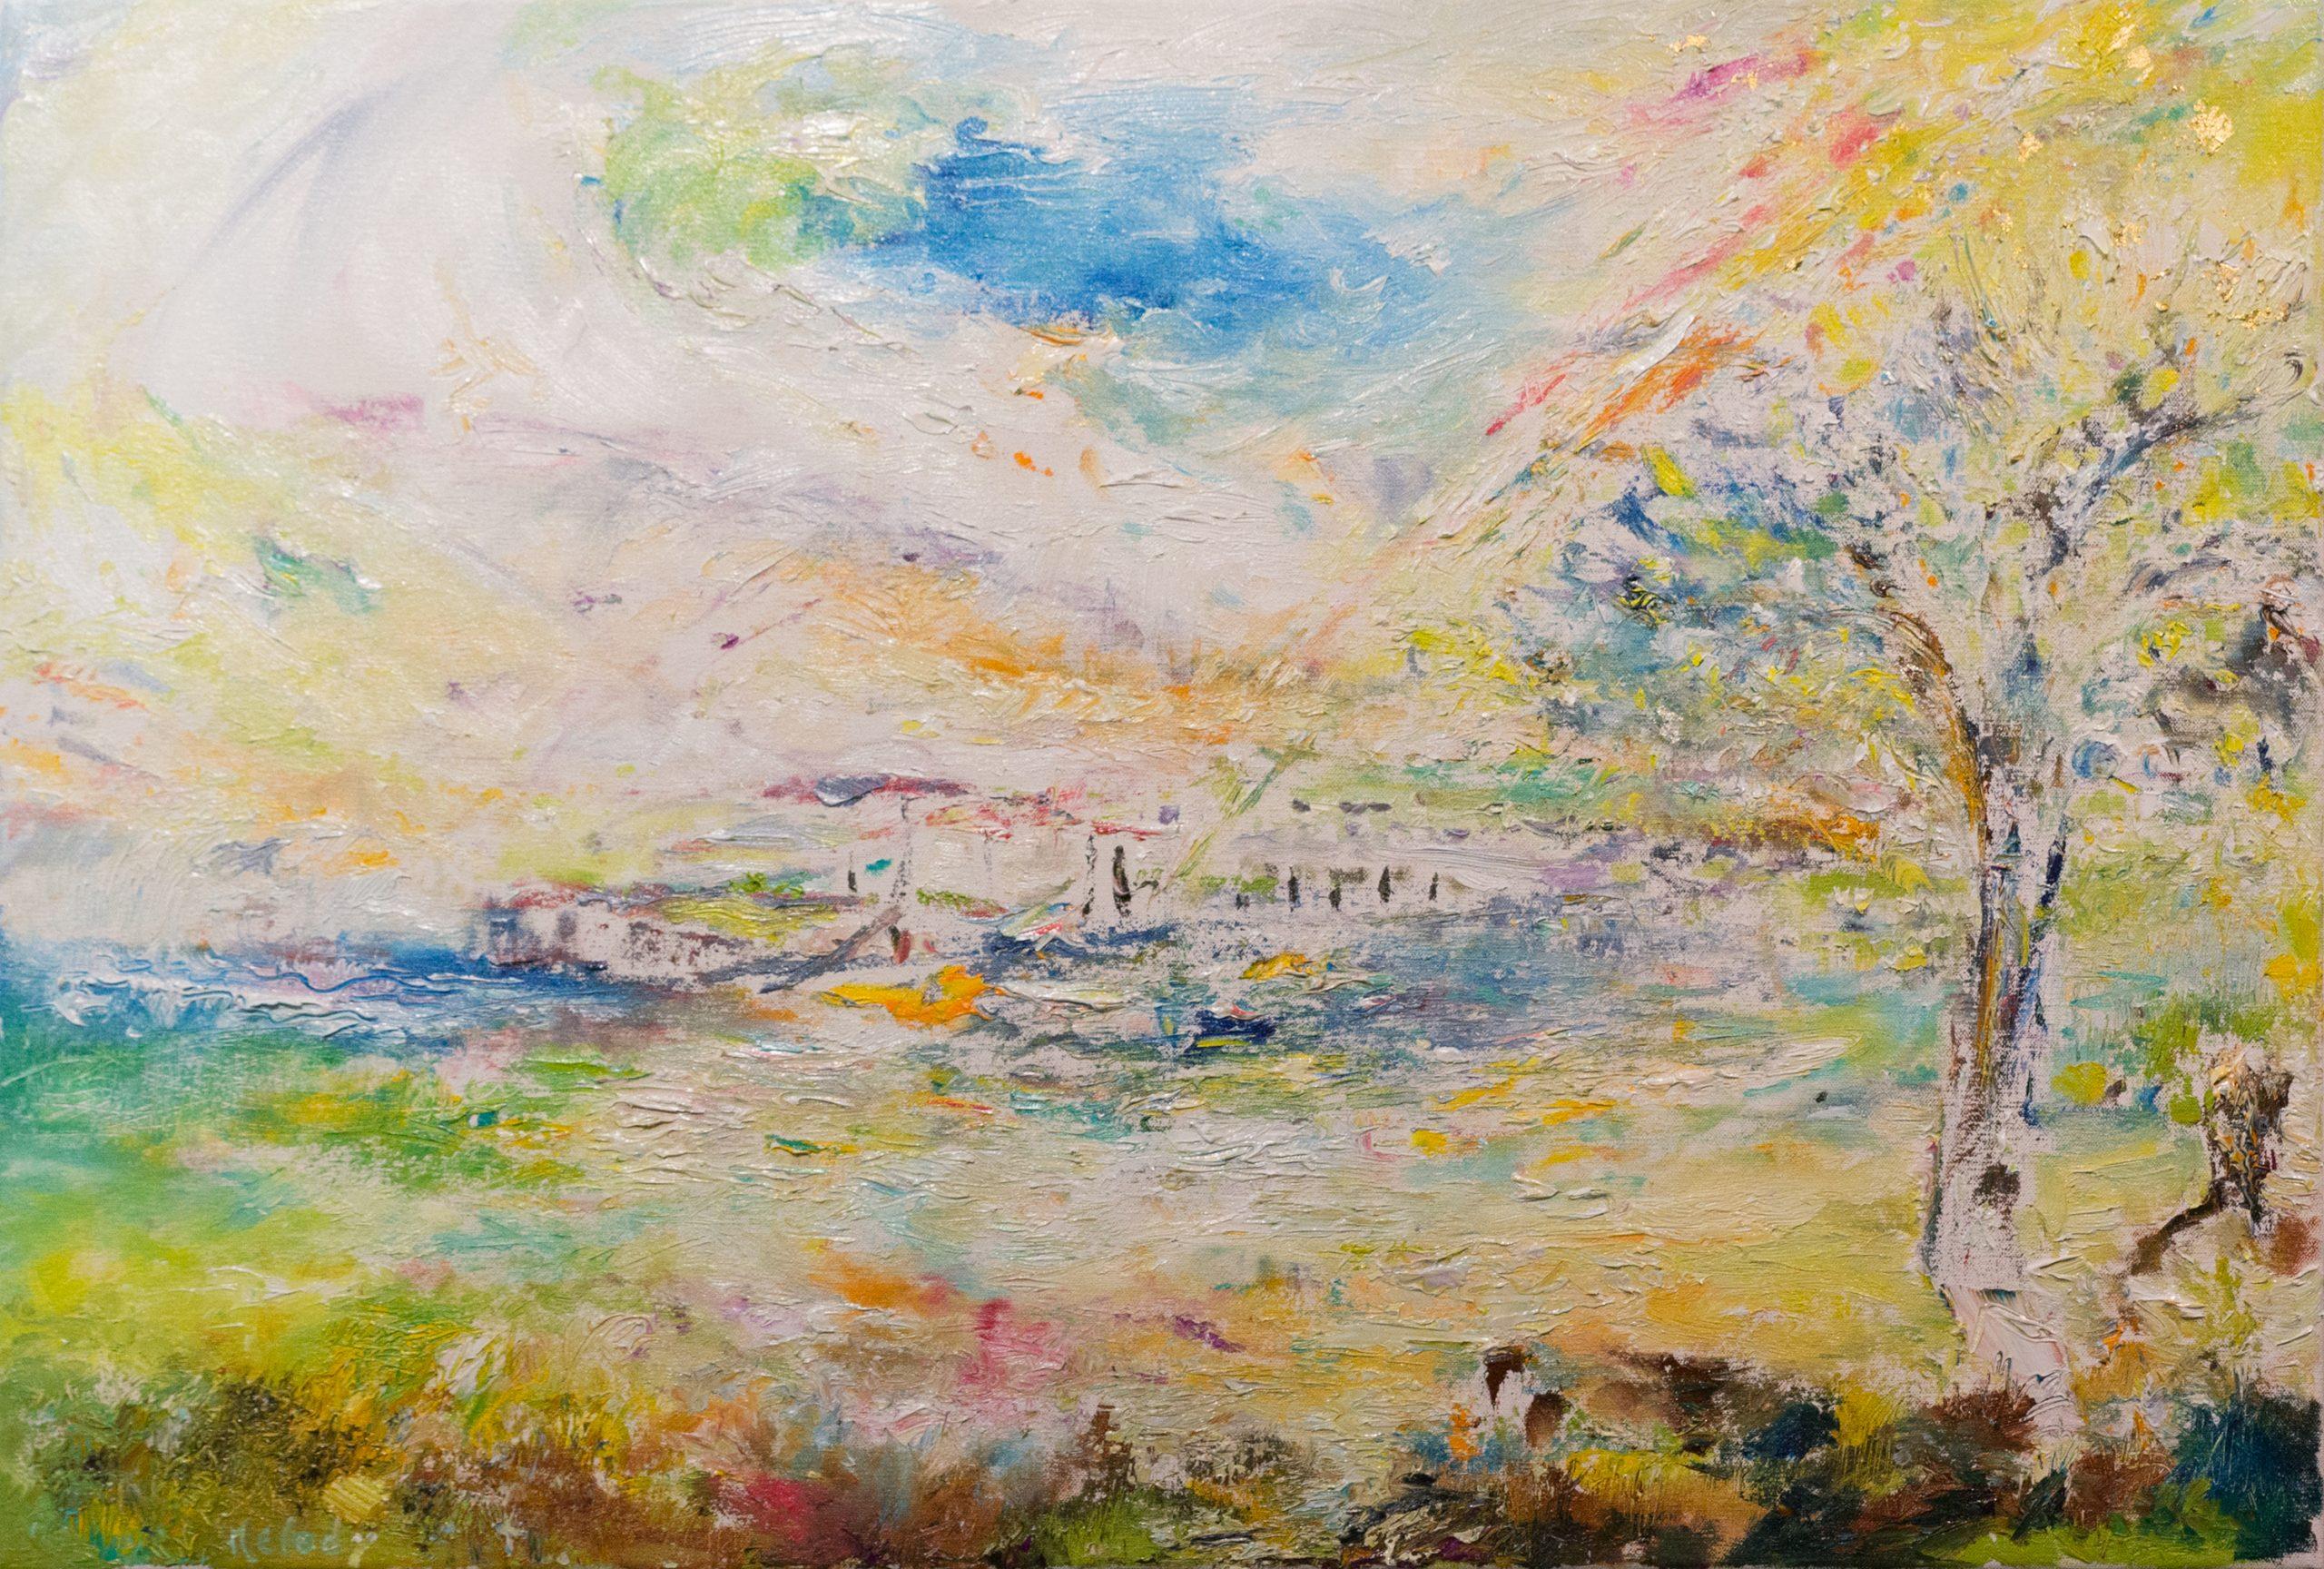 Rainbow Valley - Holnicote on Exmoor